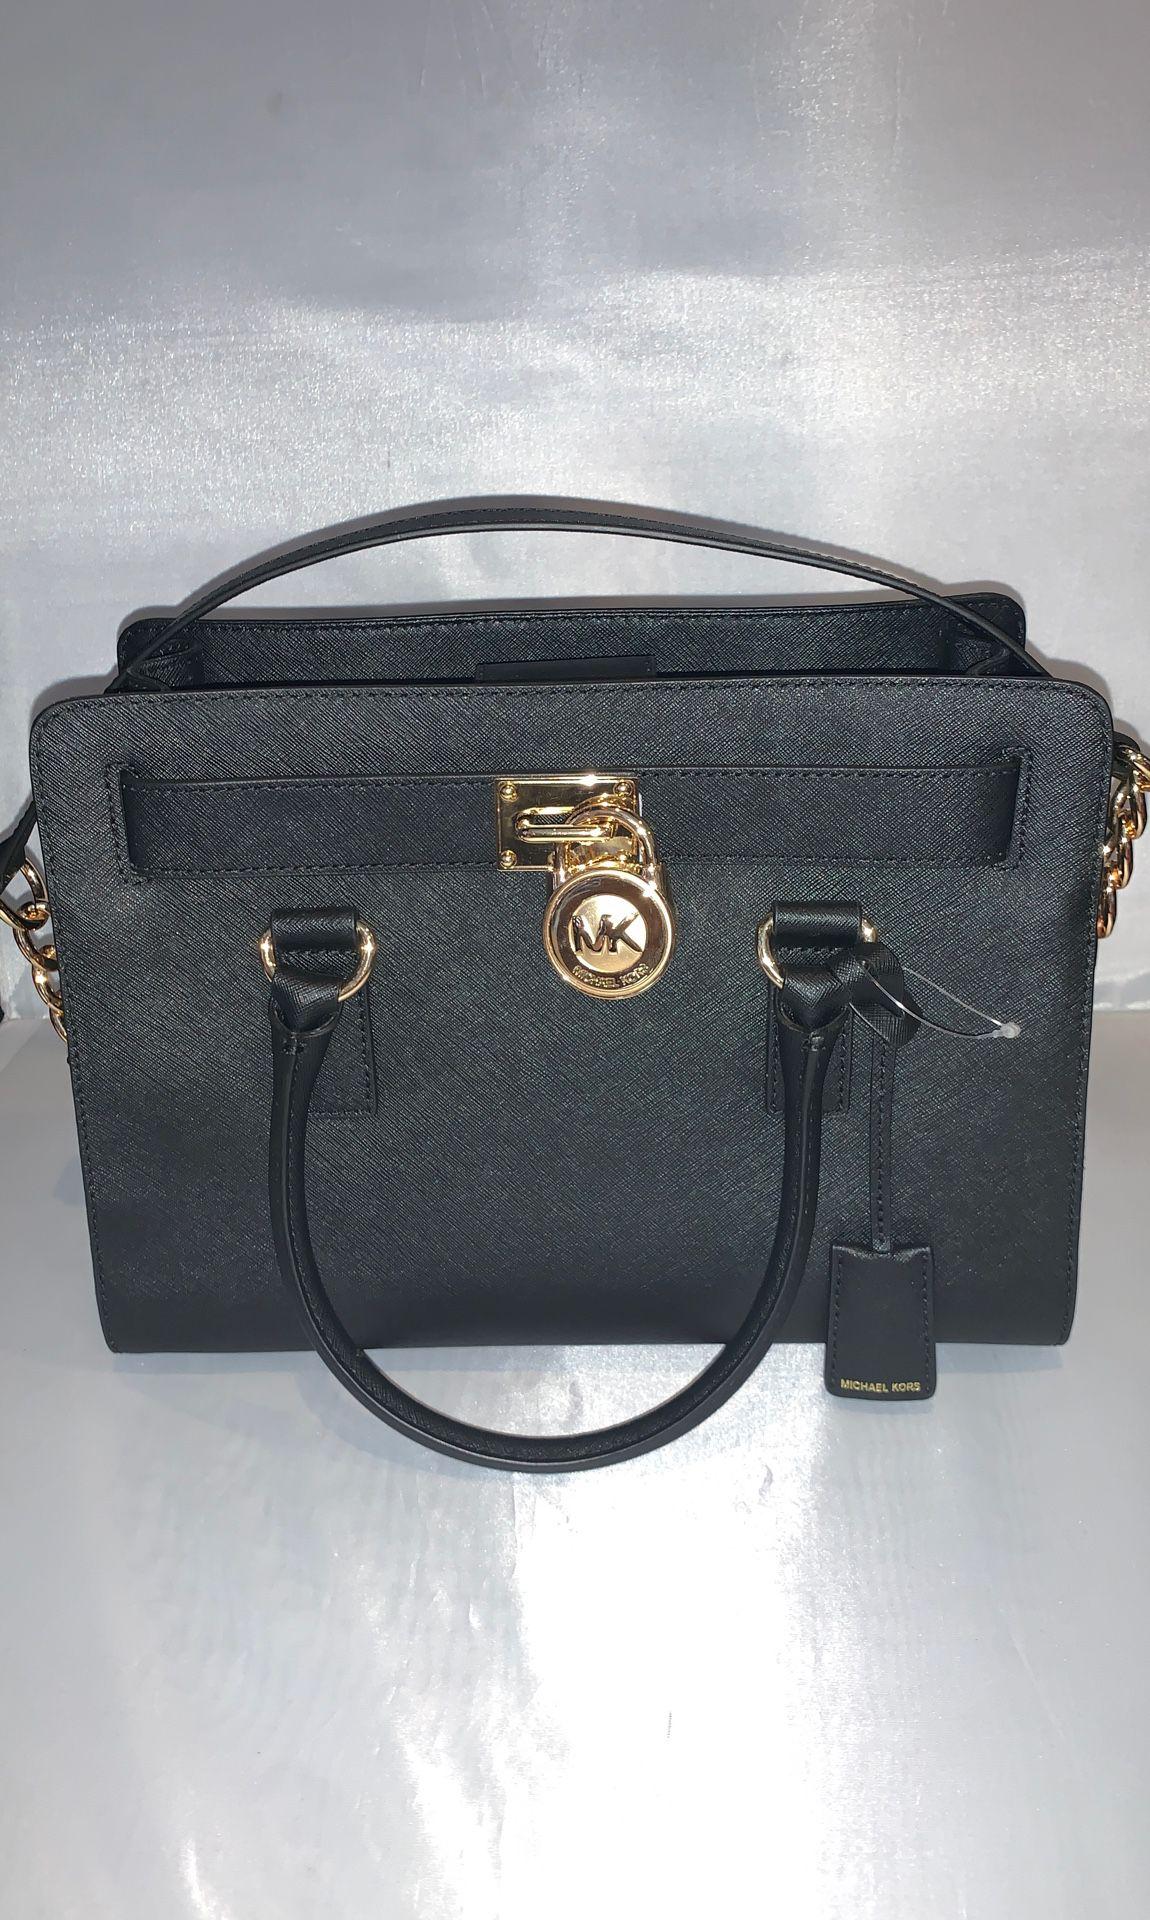 Michael kors purse new & original